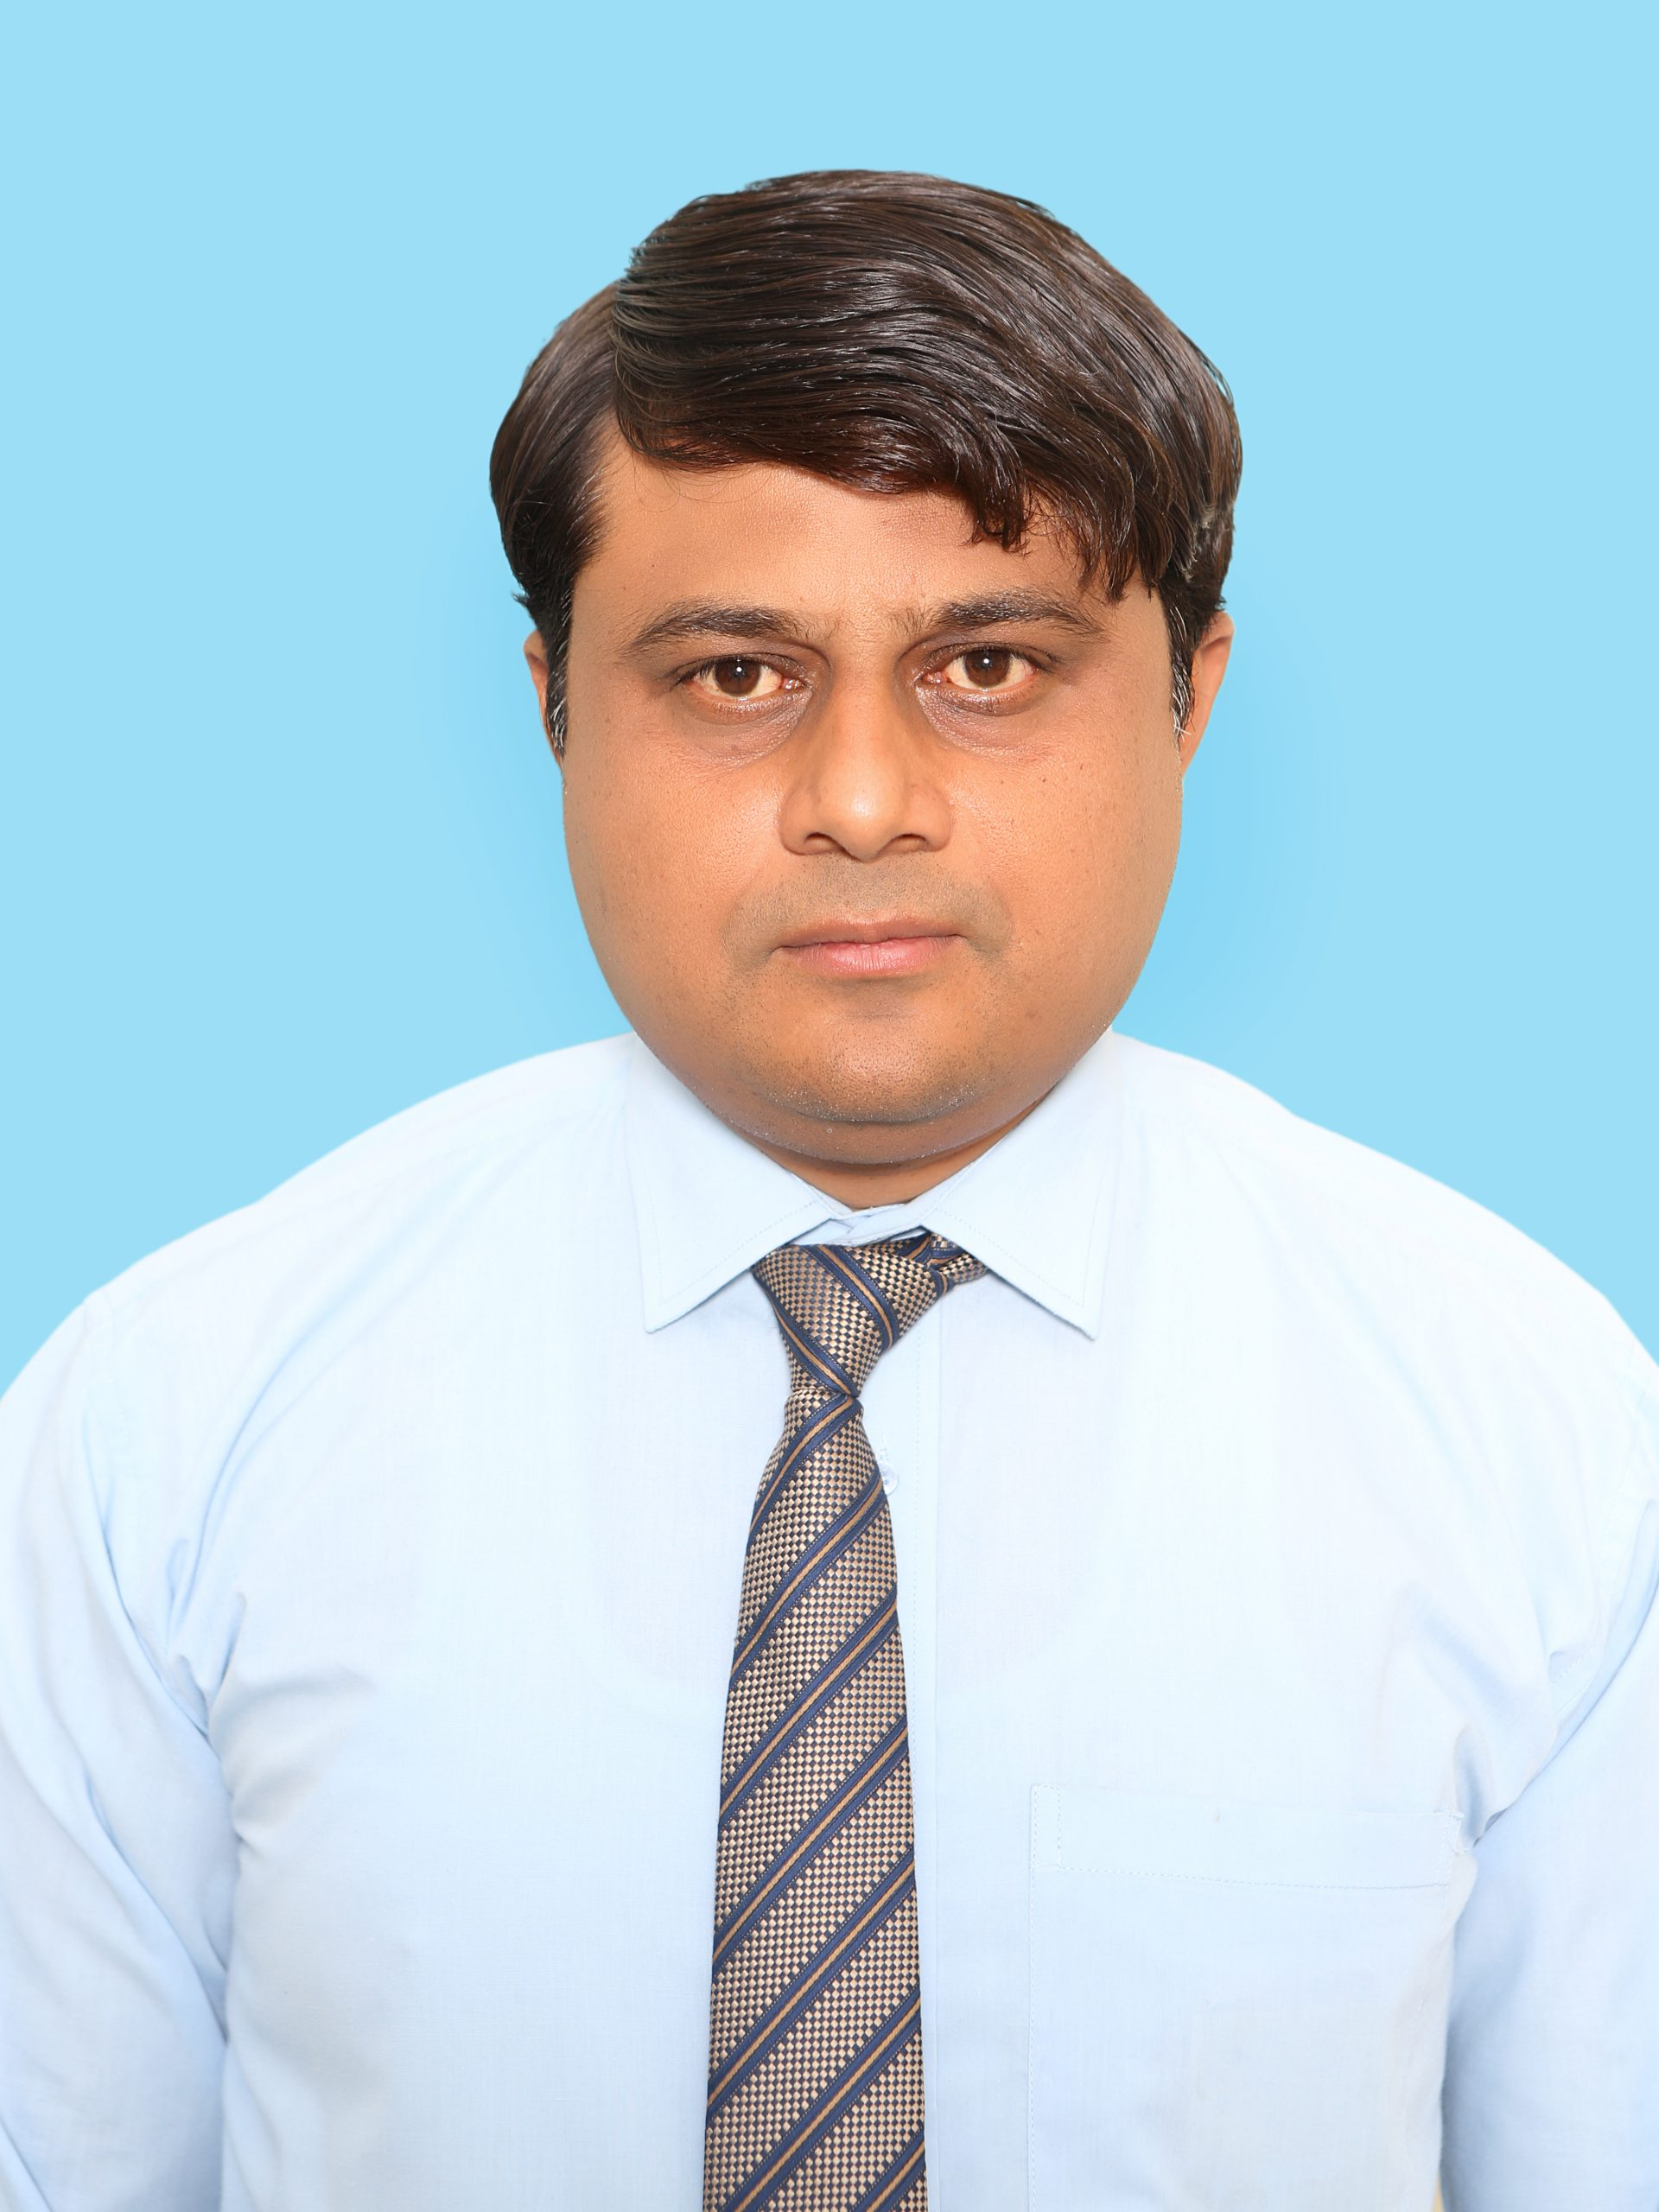 Muhammad Raza Hussain